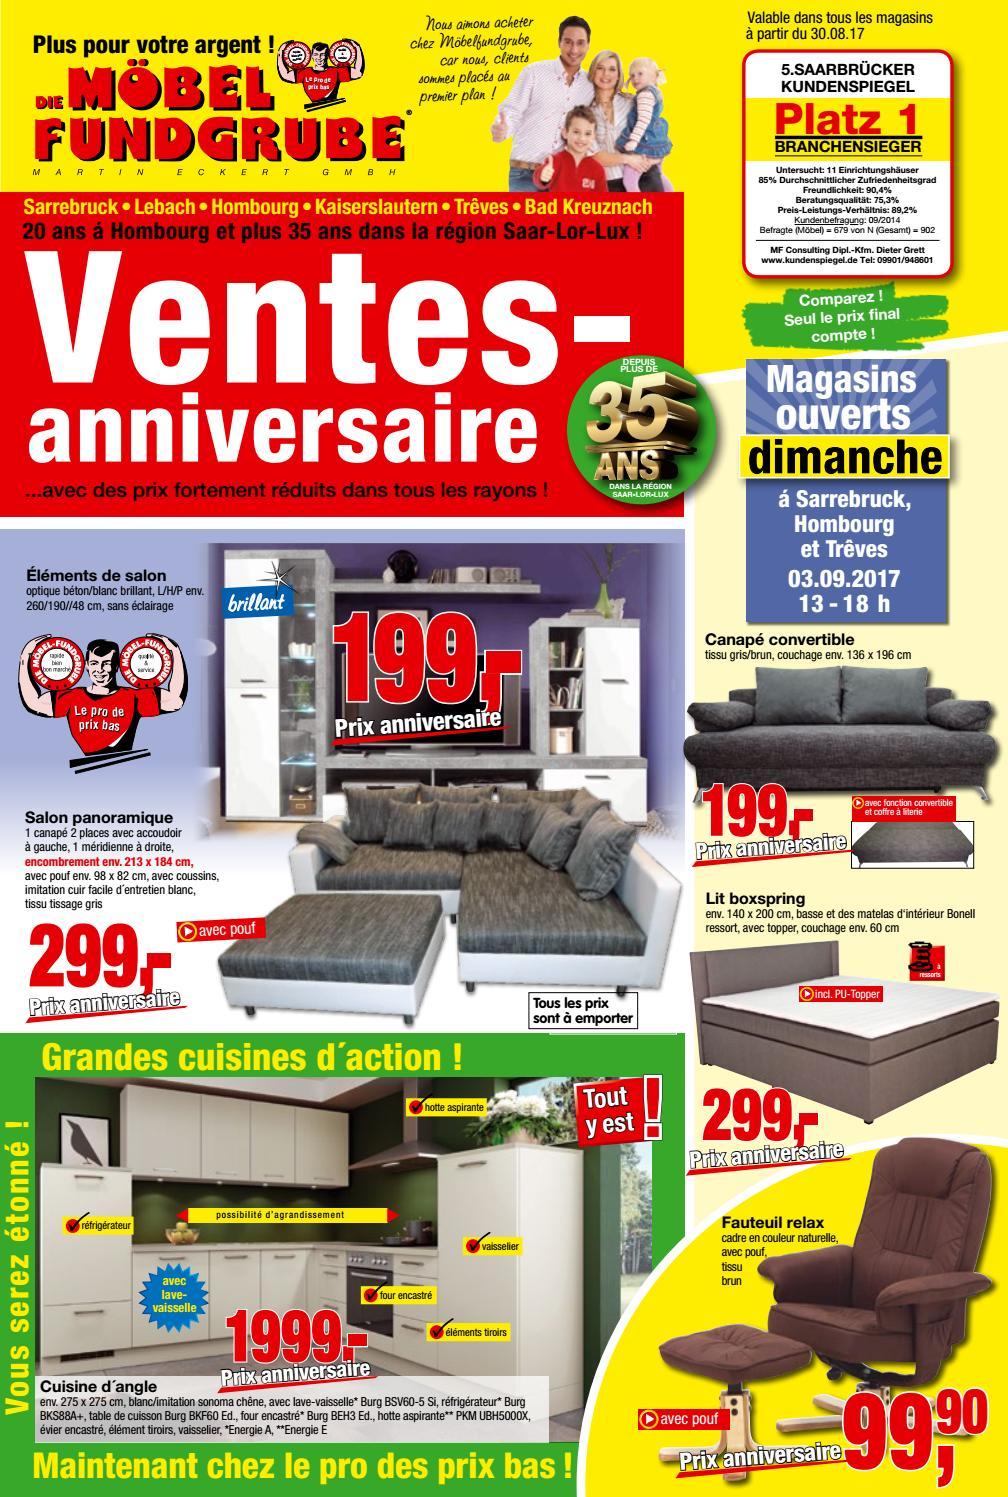 m bel fundgrube prospekt kw 35 francais by die m belfundgrube martin eckert gmbh issuu. Black Bedroom Furniture Sets. Home Design Ideas